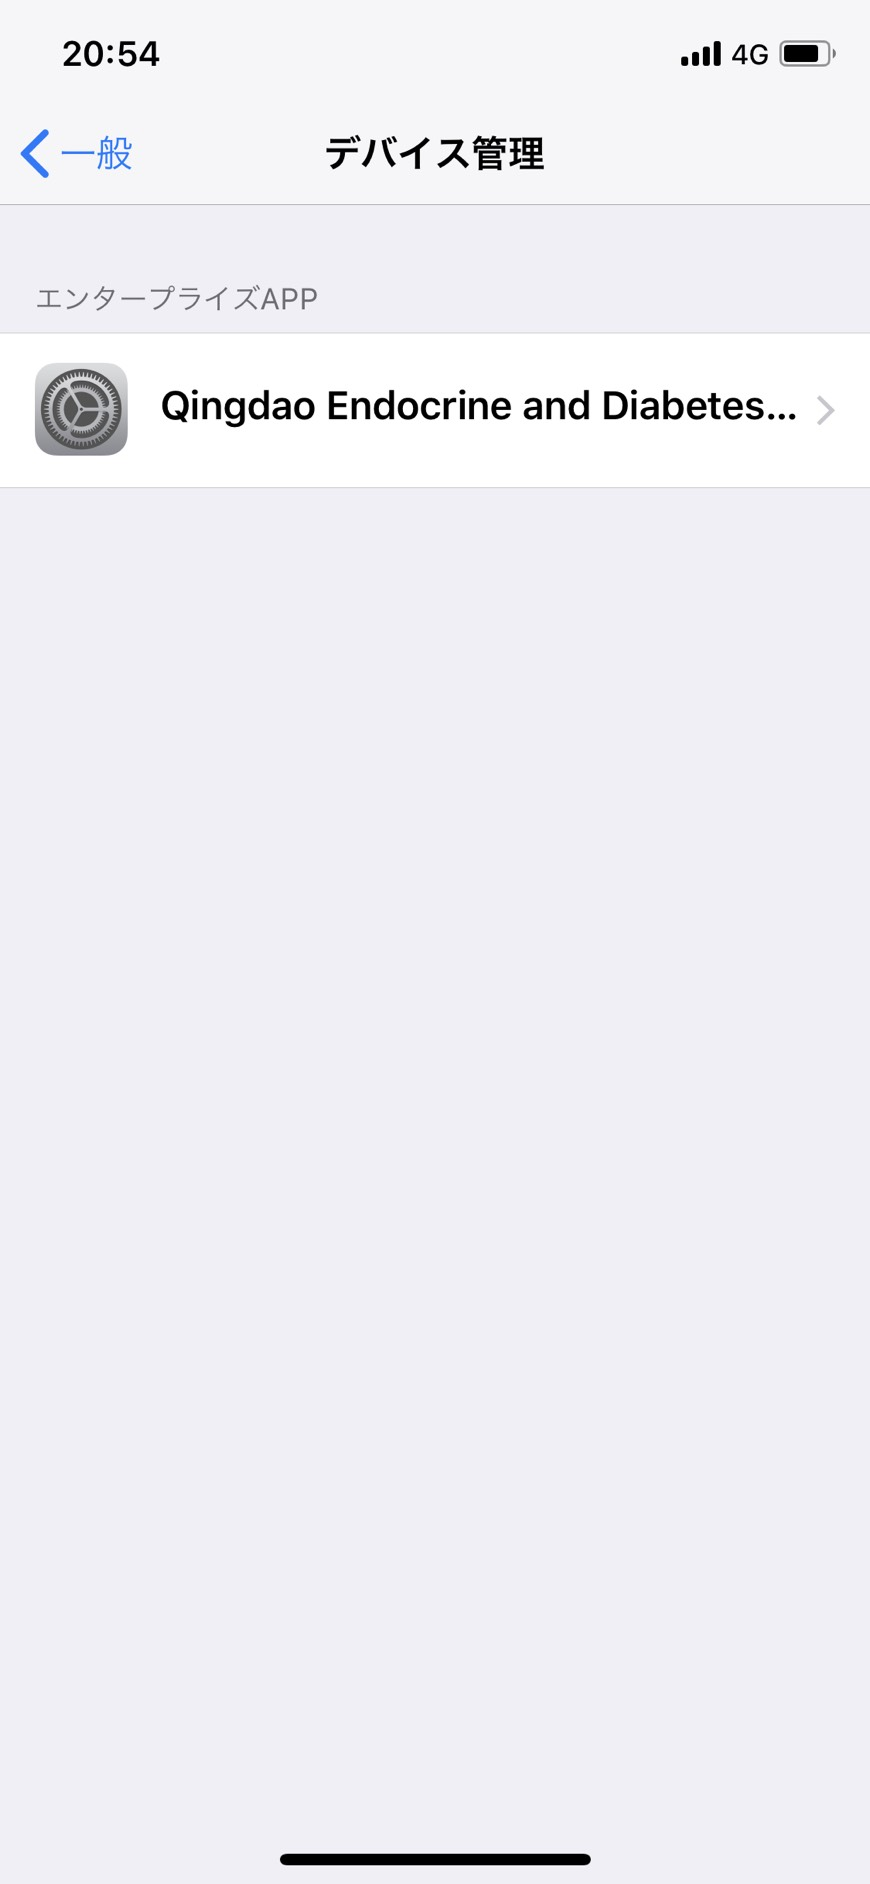 iPhoneXでデバイスを管理する画面